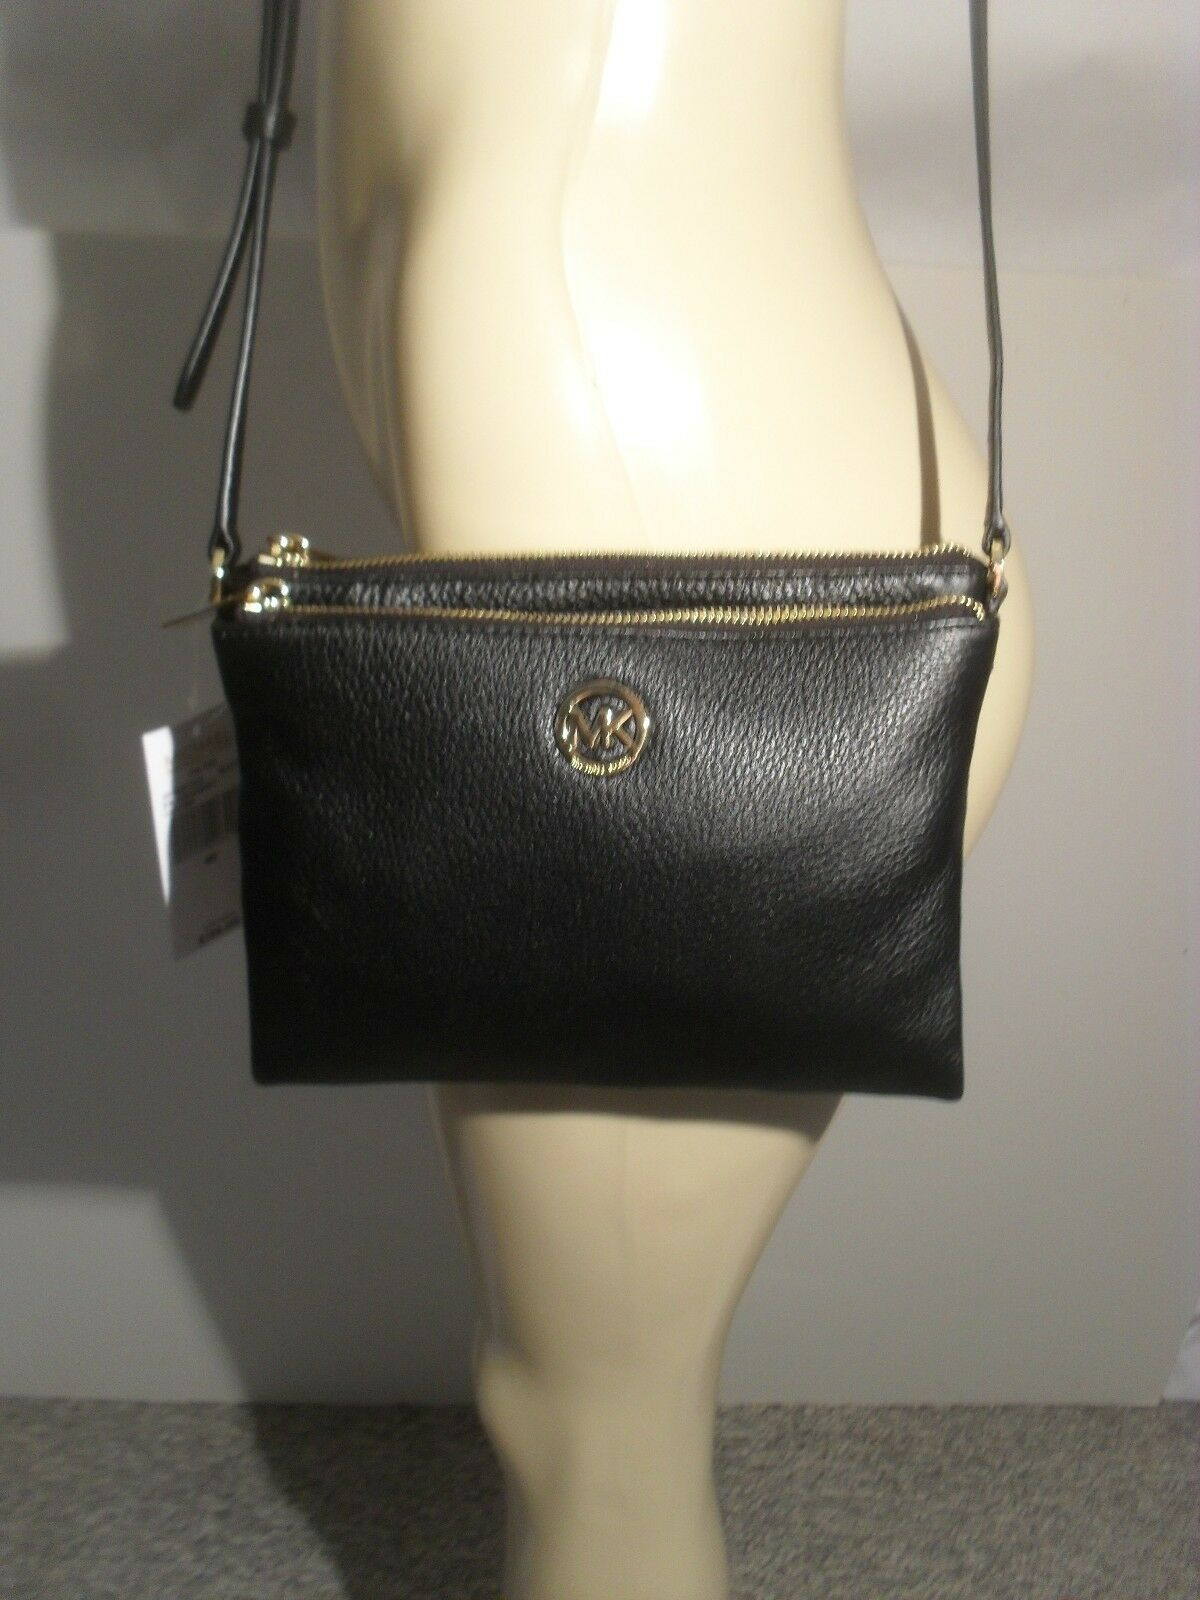 Michael Kors - NWT Michael Kors Fulton Black Leather Large Crossbody Bag MK Messenger Purse